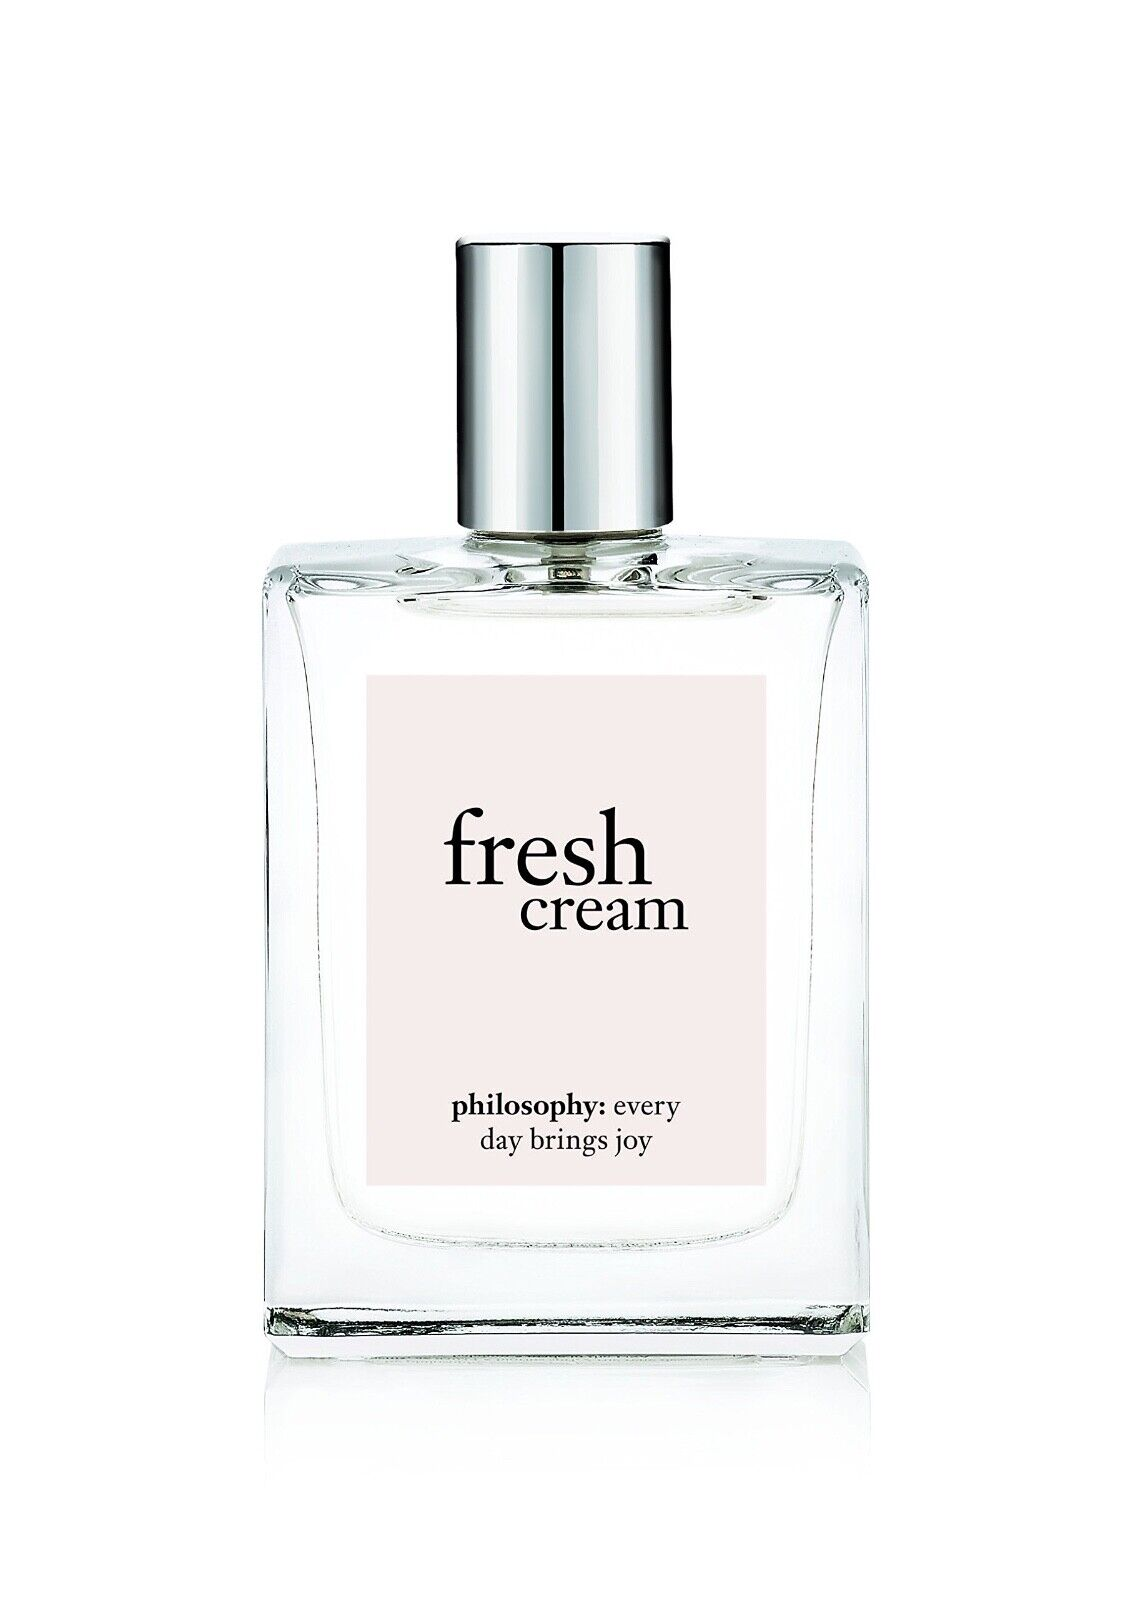 Philosophy Fresh Cream for Women 2 fl oz Eau De Toilette Spr